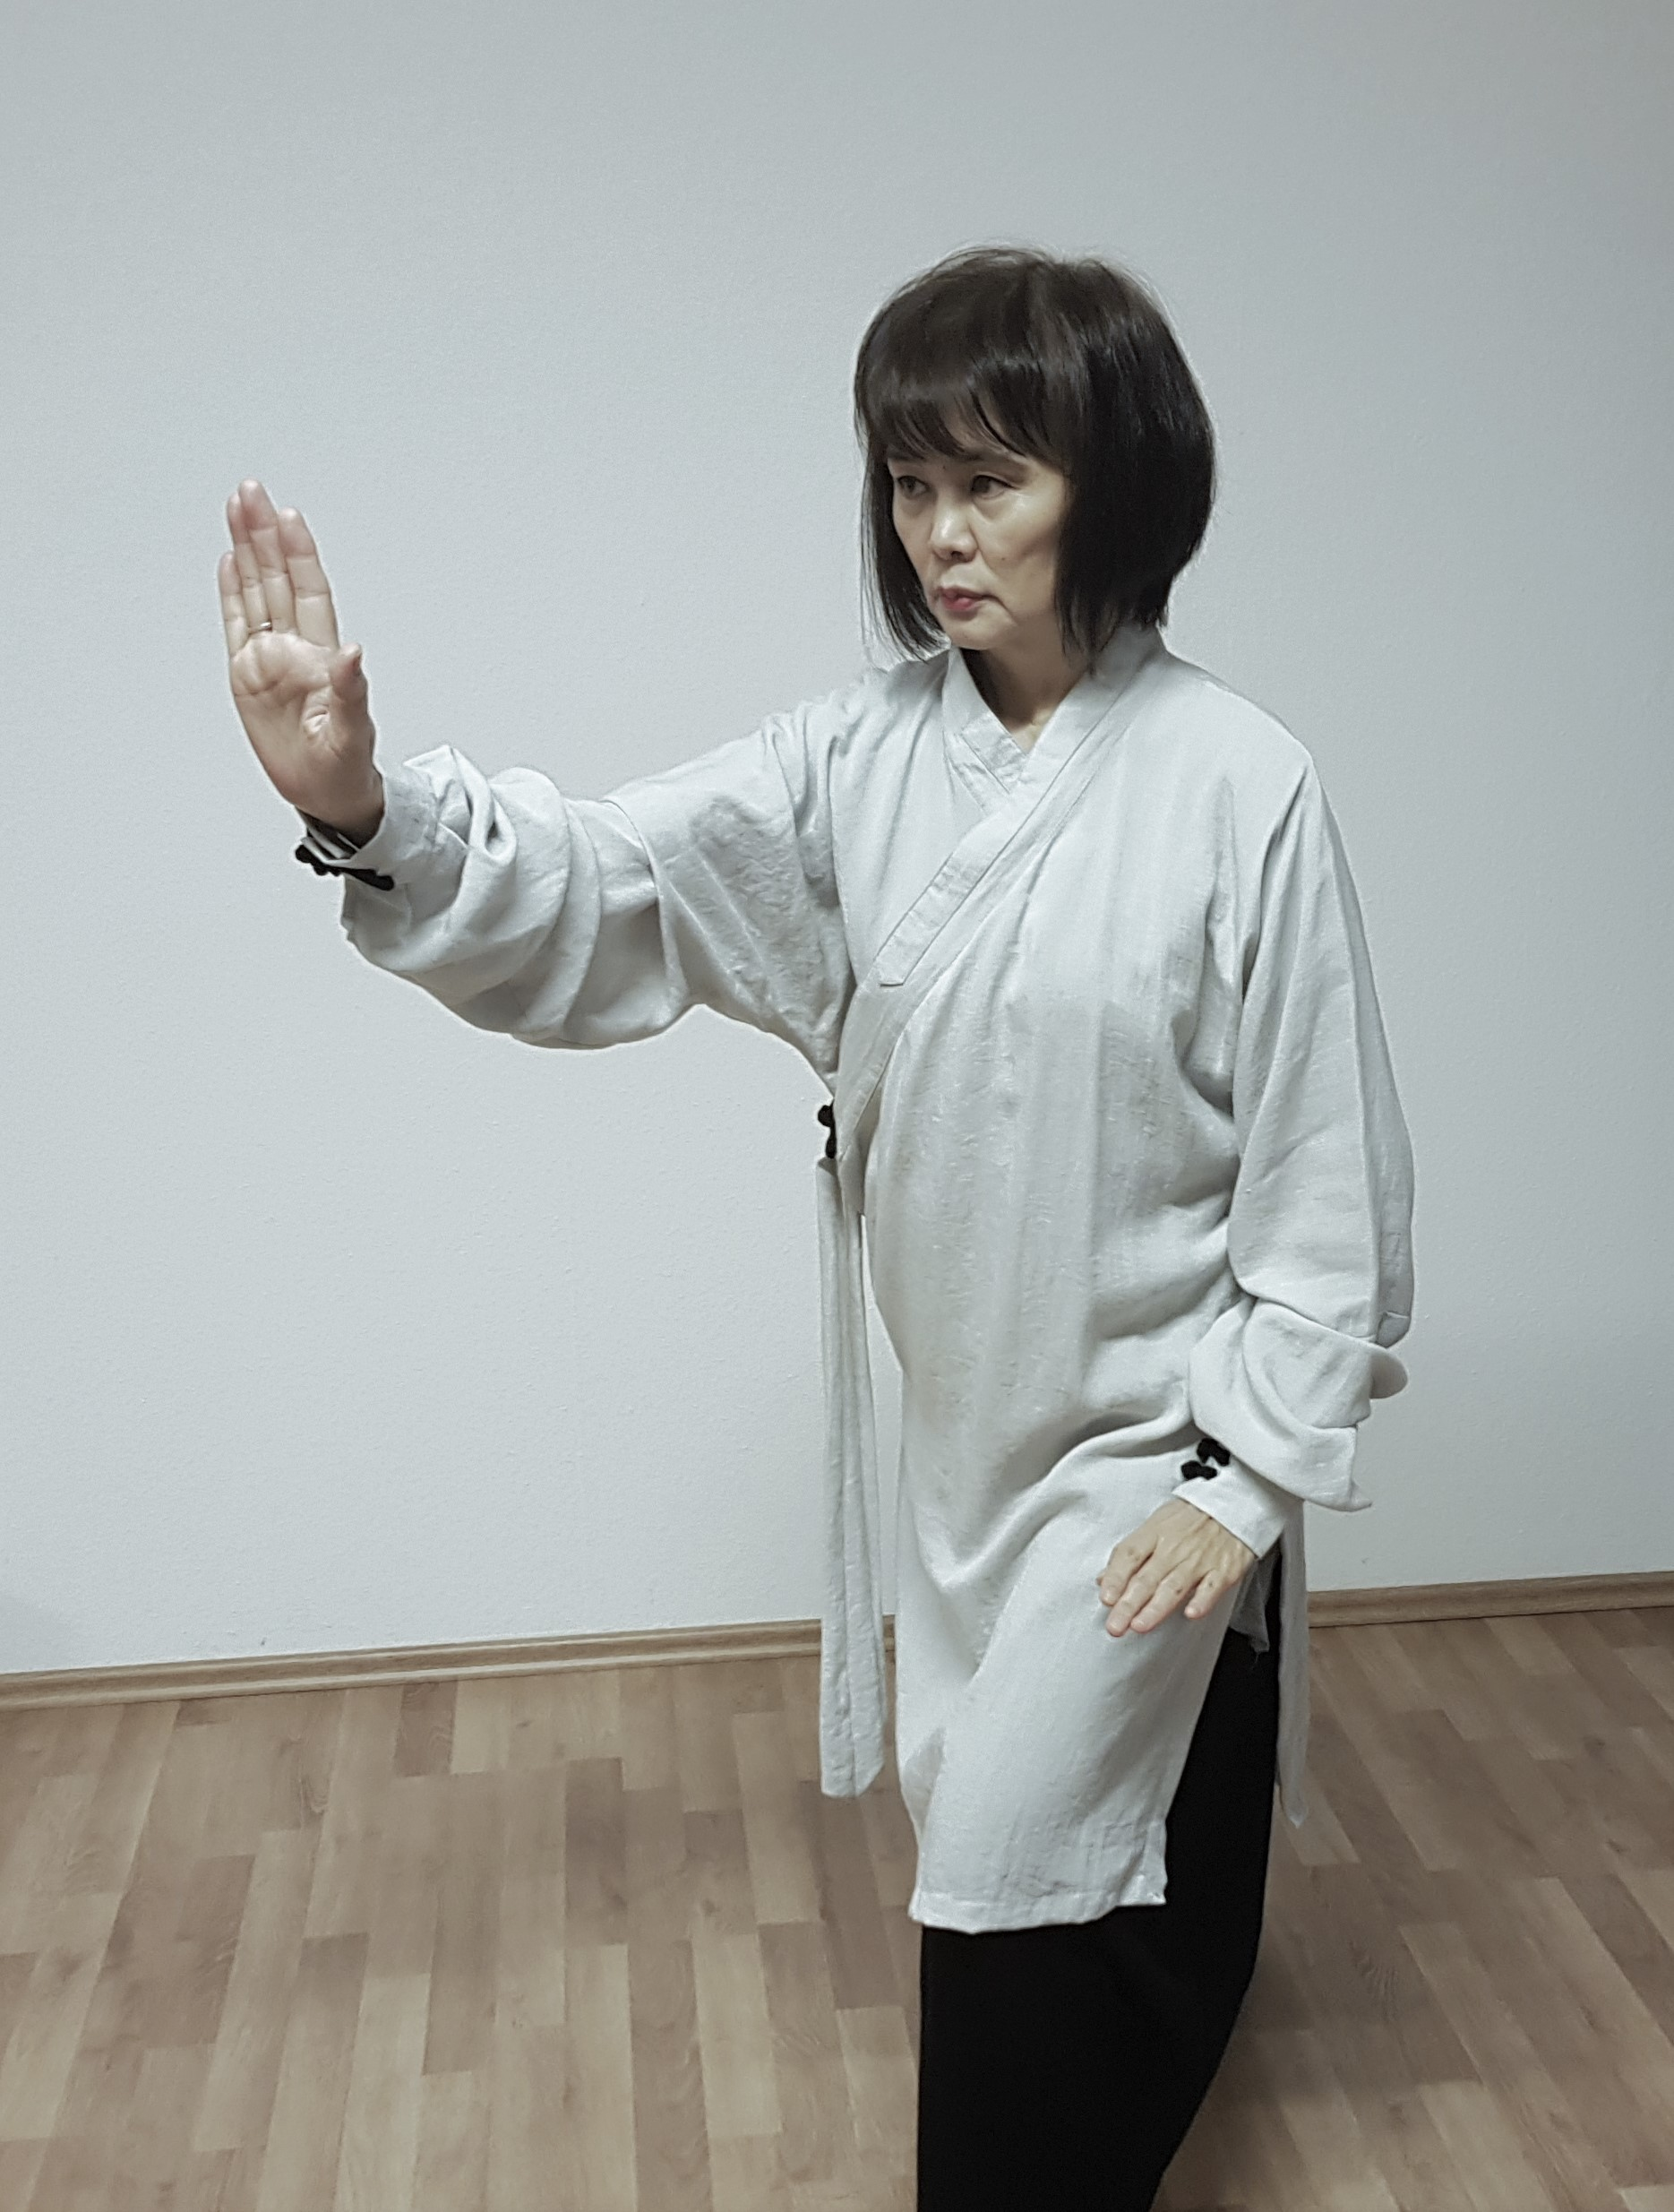 Wu Tai Chi Wien Einsteiger-Anfängerkurs 15 Bewegungen Kurzform